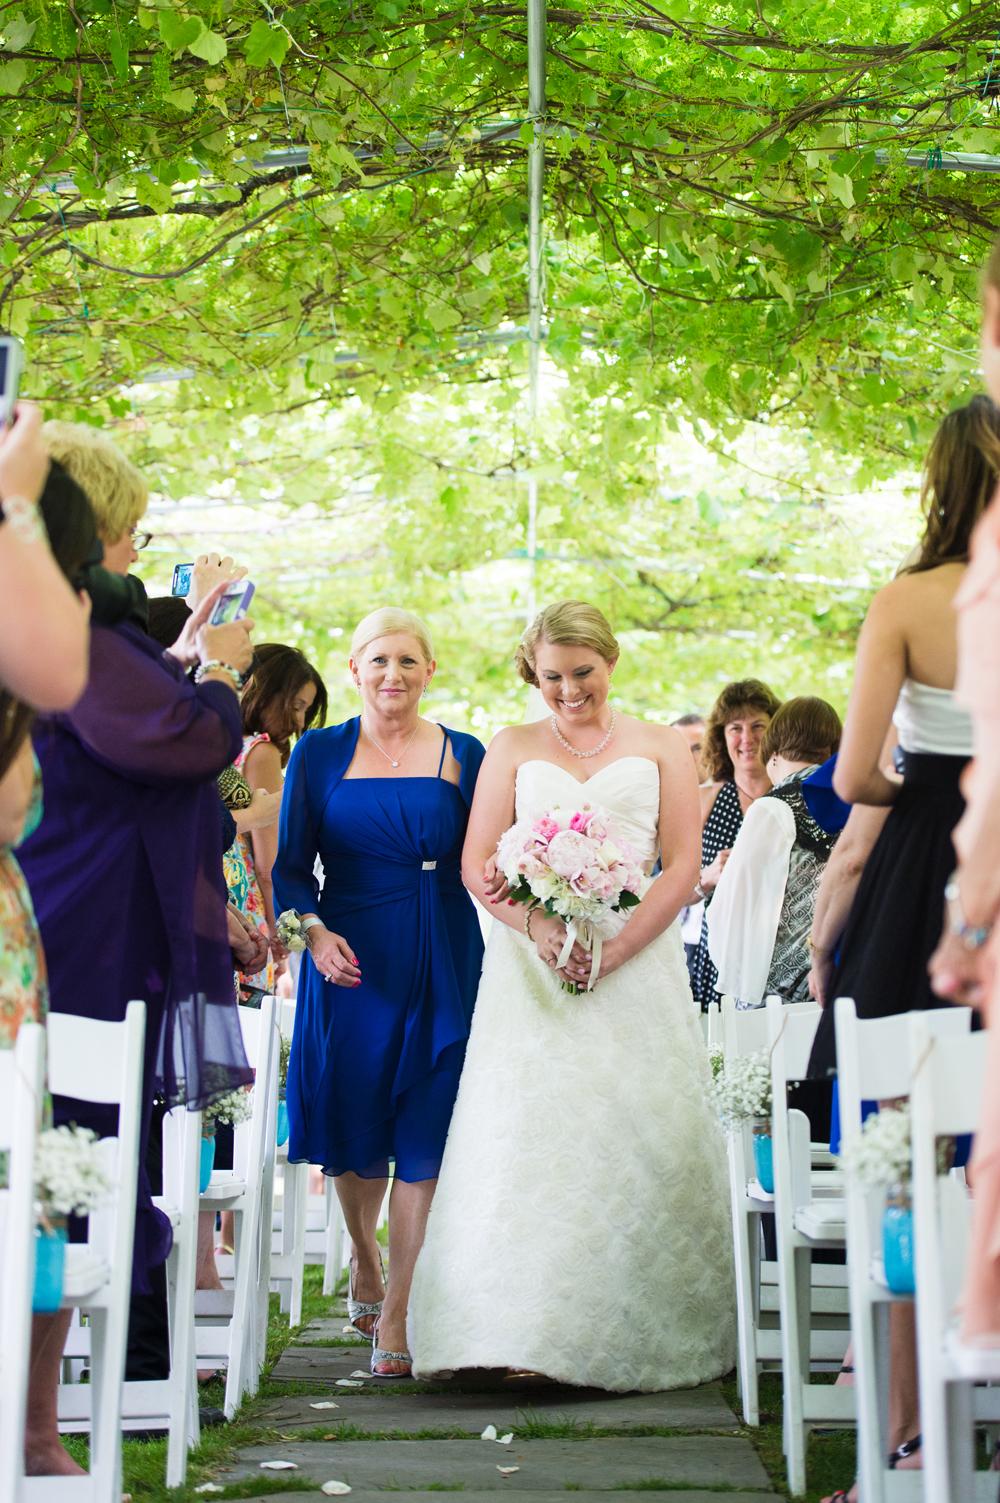 Tarrywile-Mansion-Wedding-Greg-Lewis-Photo-44